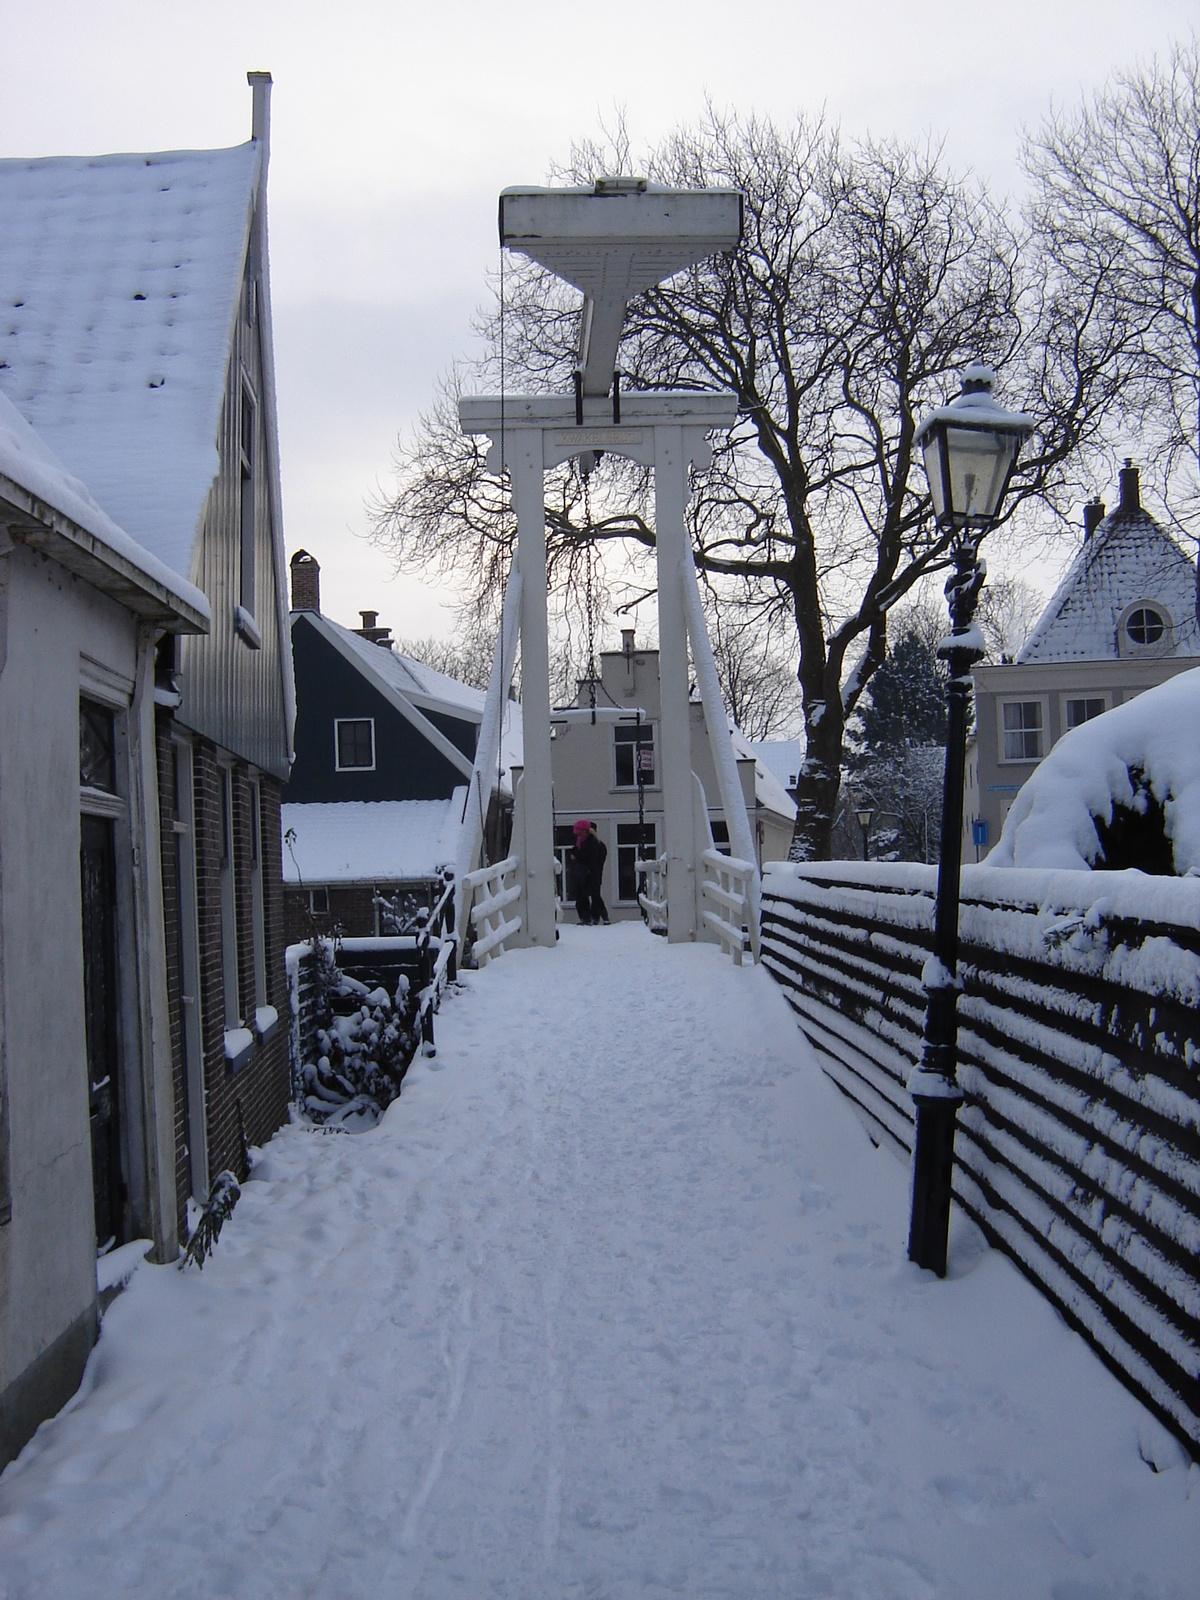 Kwakelbridge Edam Netherlands